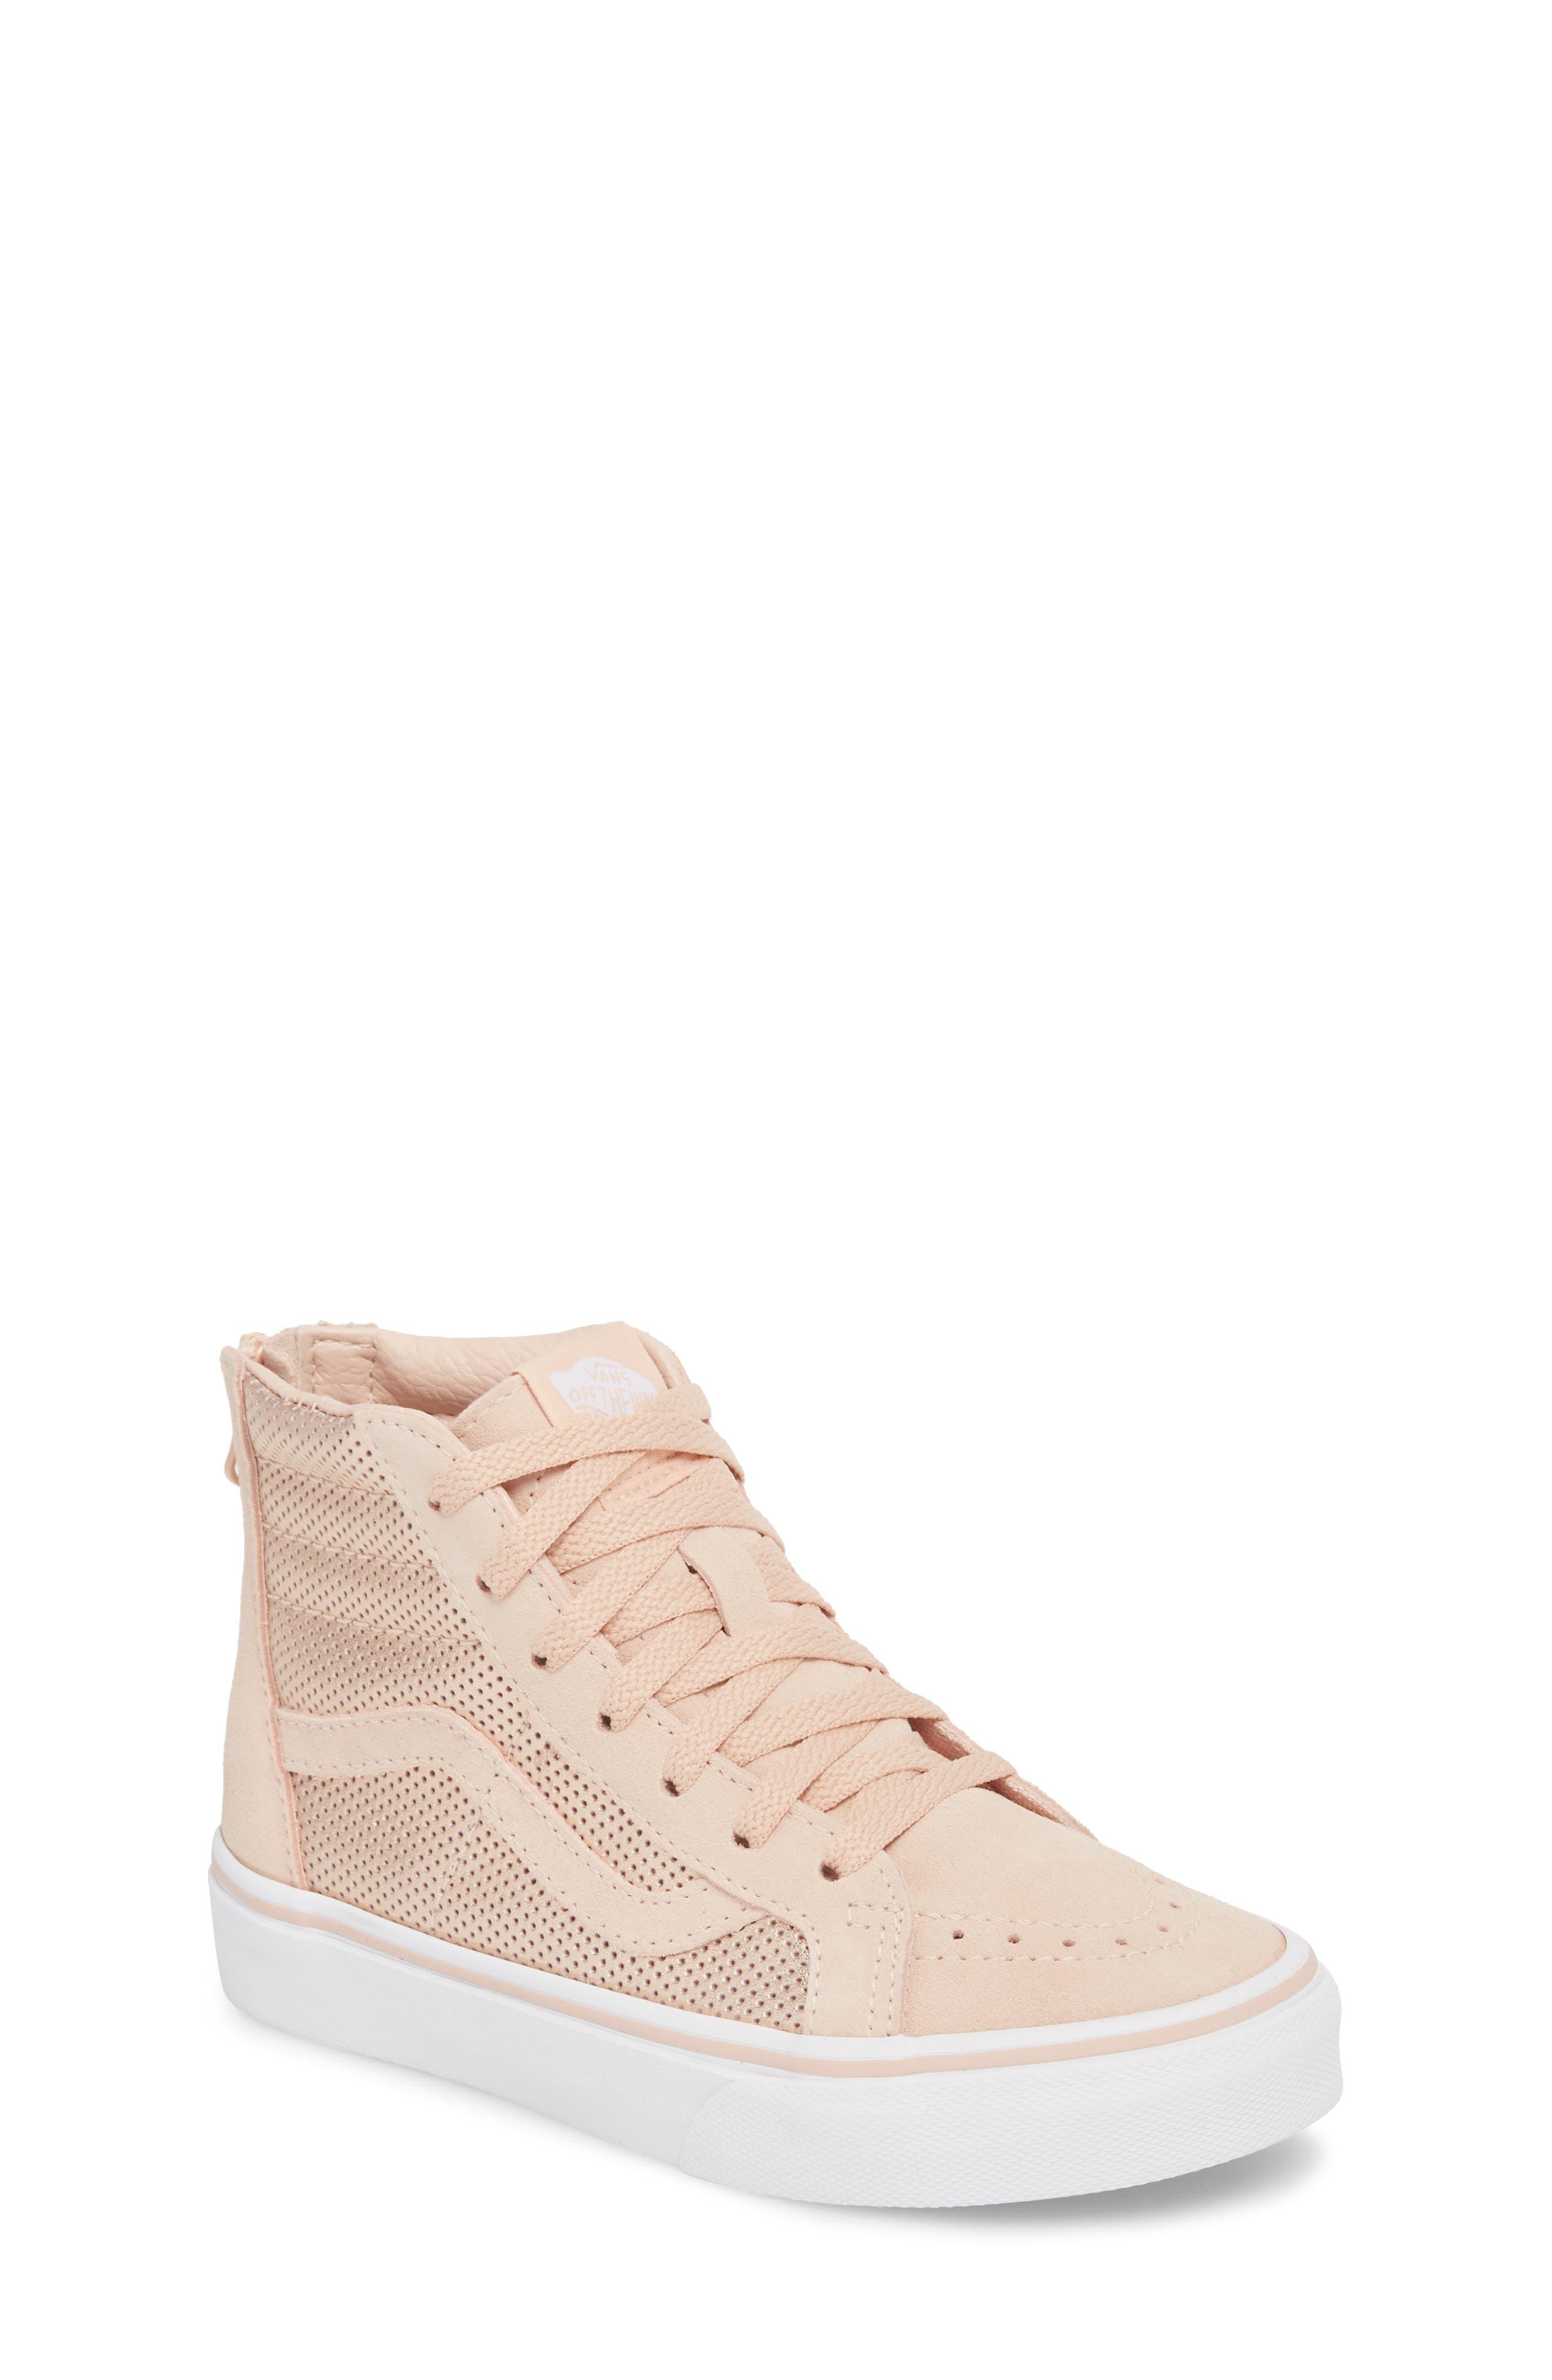 SK8-Hi Zip Sneaker,                             Main thumbnail 1, color,                             Rose Gold Suede Leather